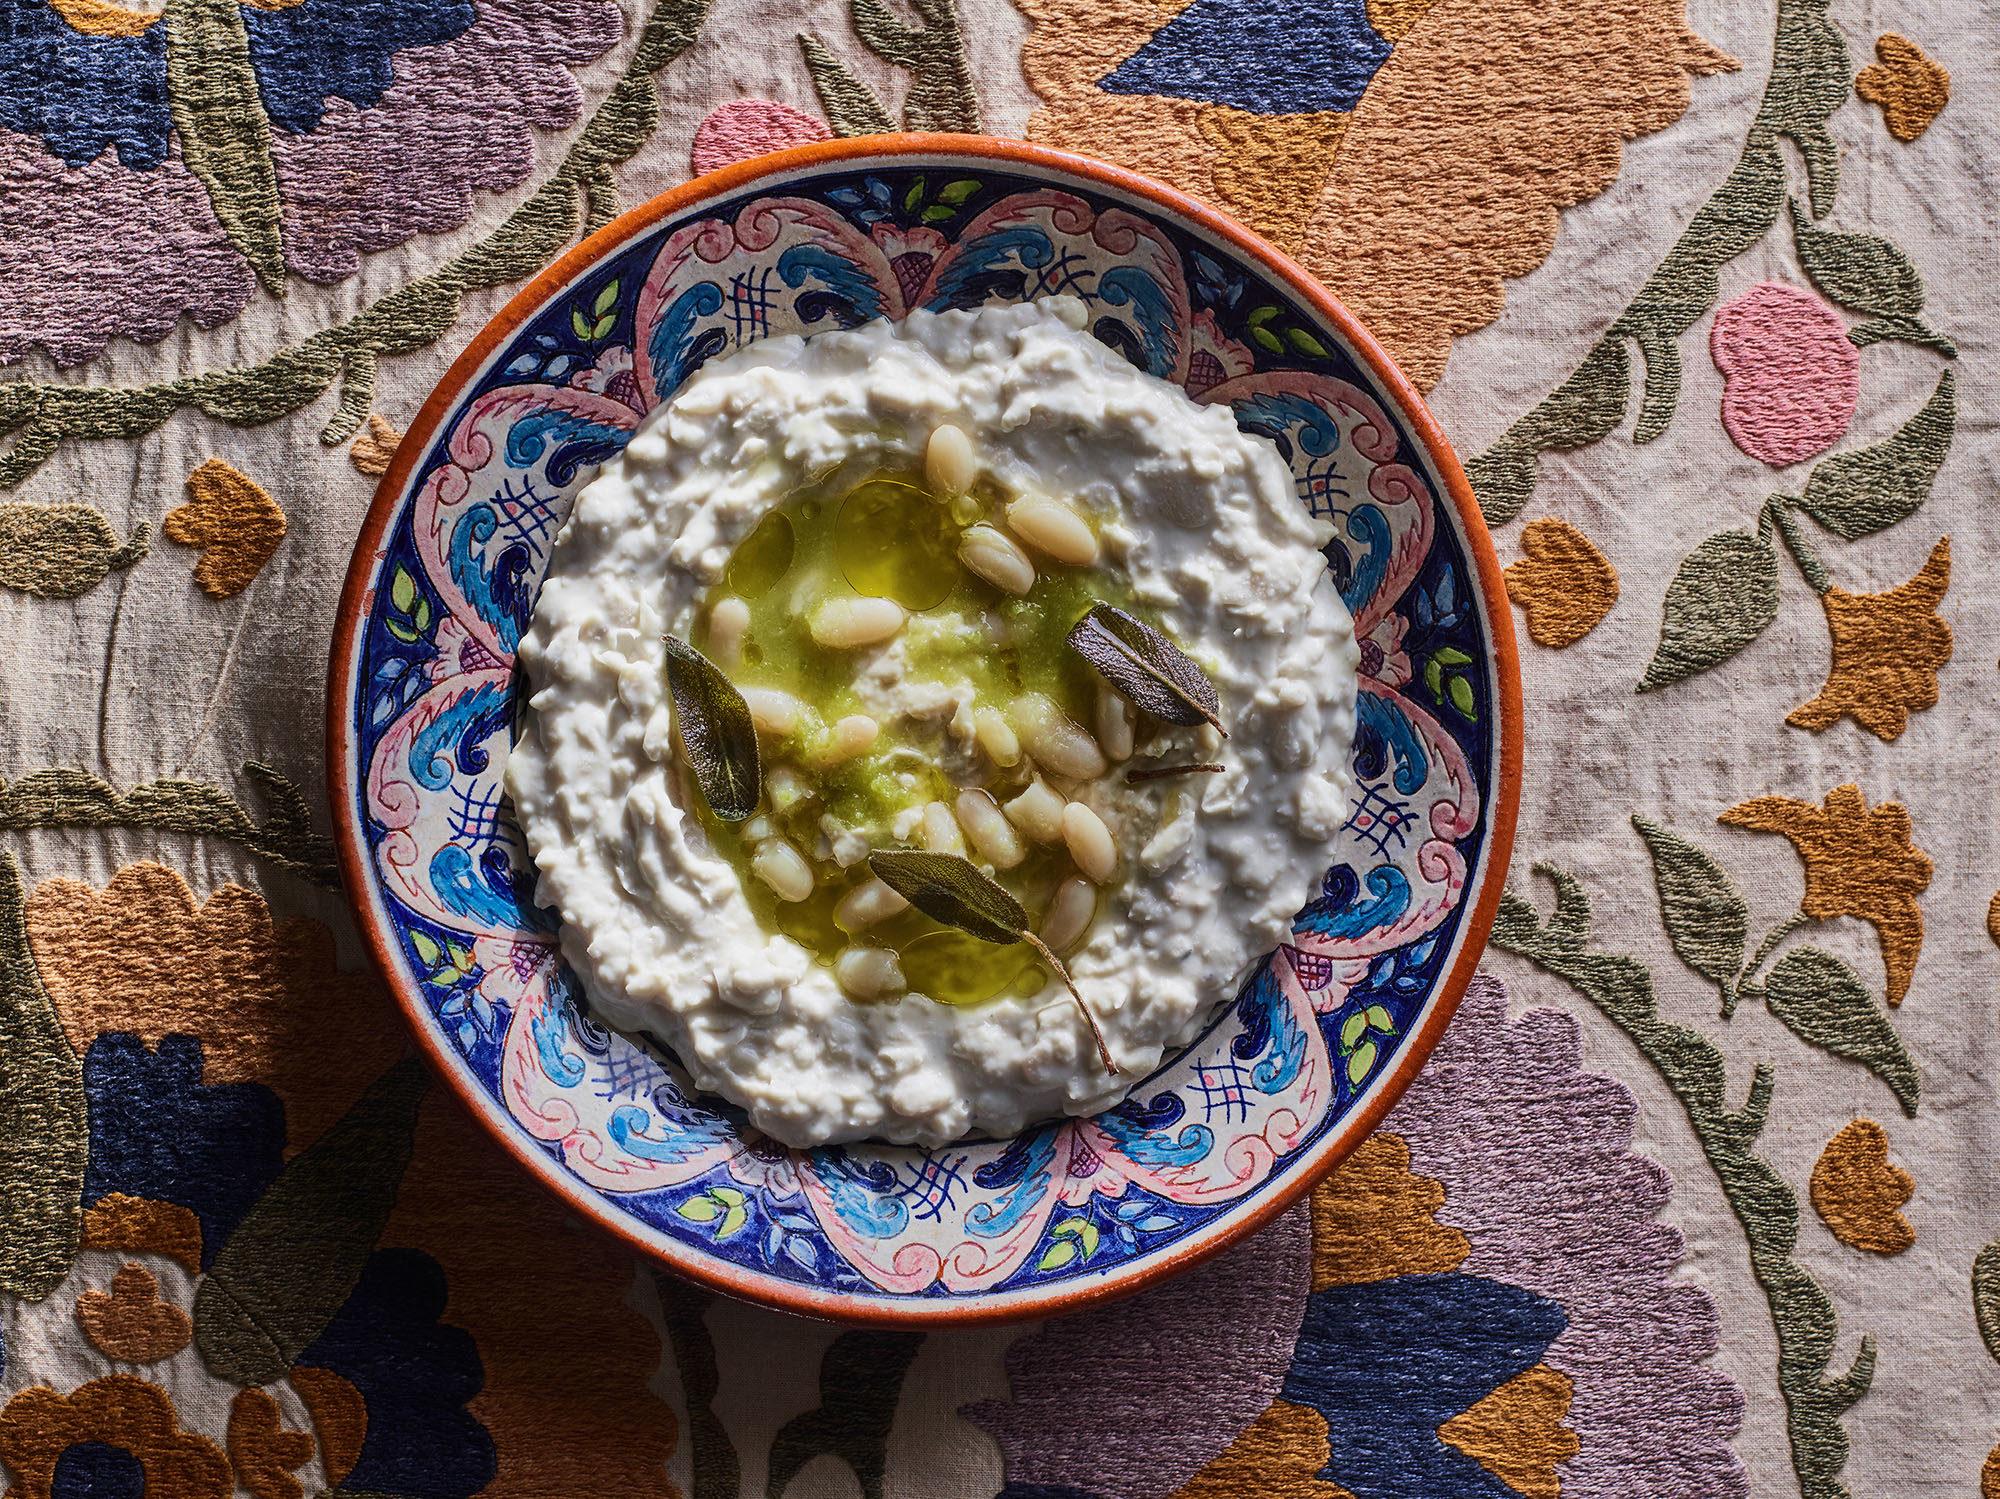 White bean masabacha in a ceramic bowl